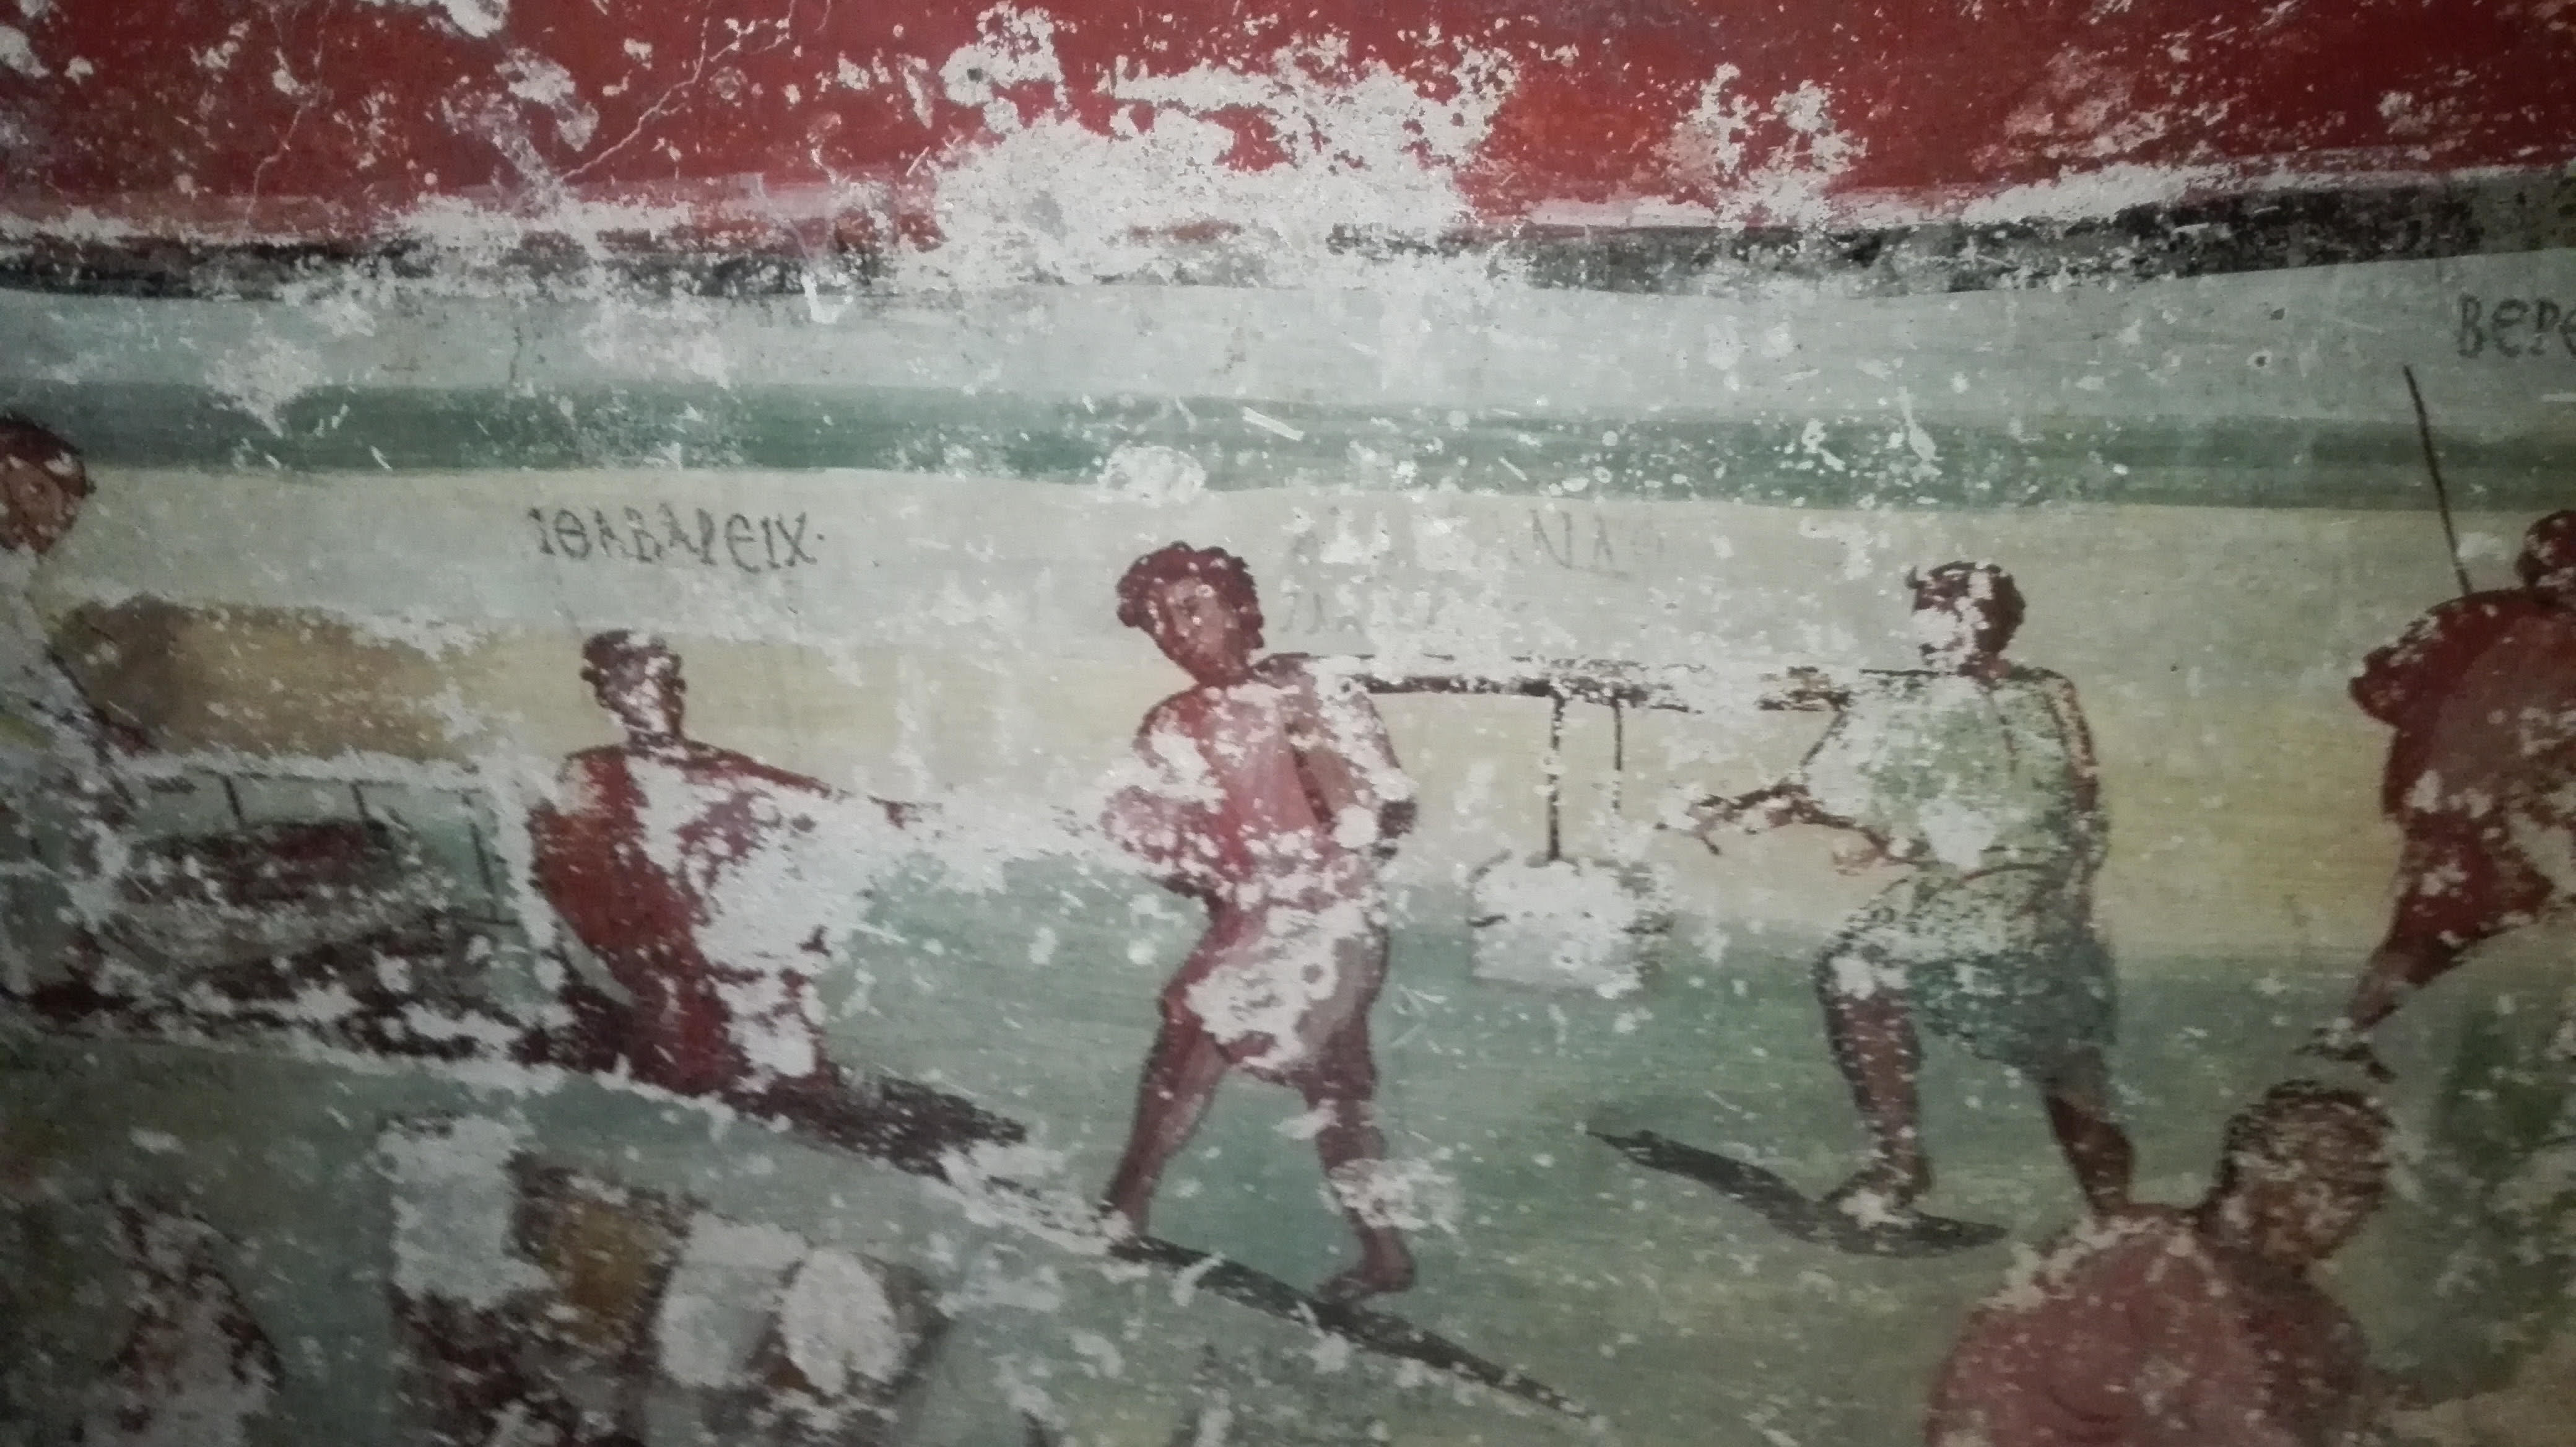 http://www.thehistoryblog.com/wp-content/uploads/2016/12/Jordan-fresco-3.jpg